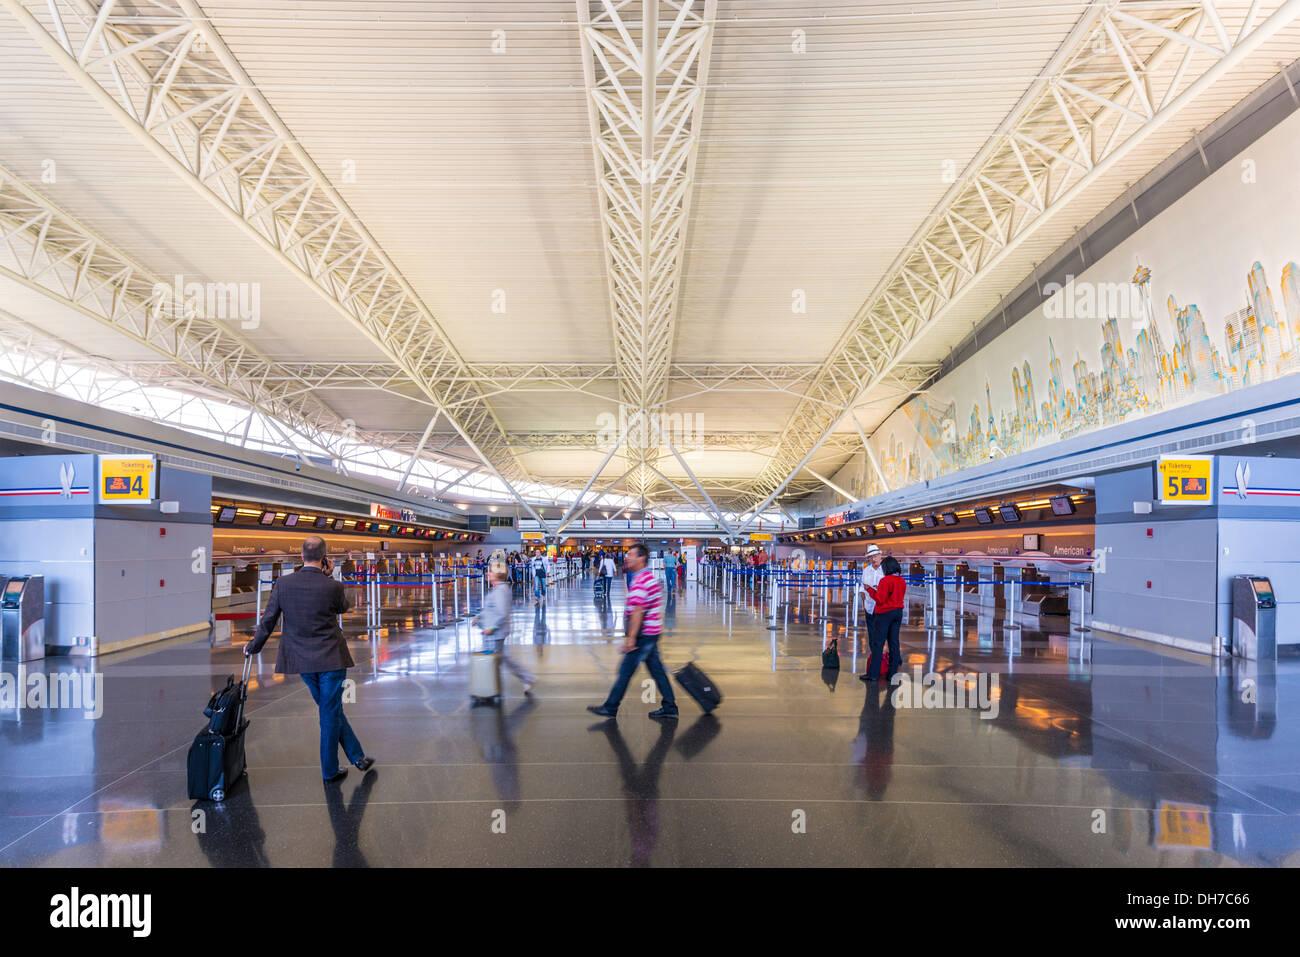 JFK Airport ticket terminal in New York City. - Stock Image